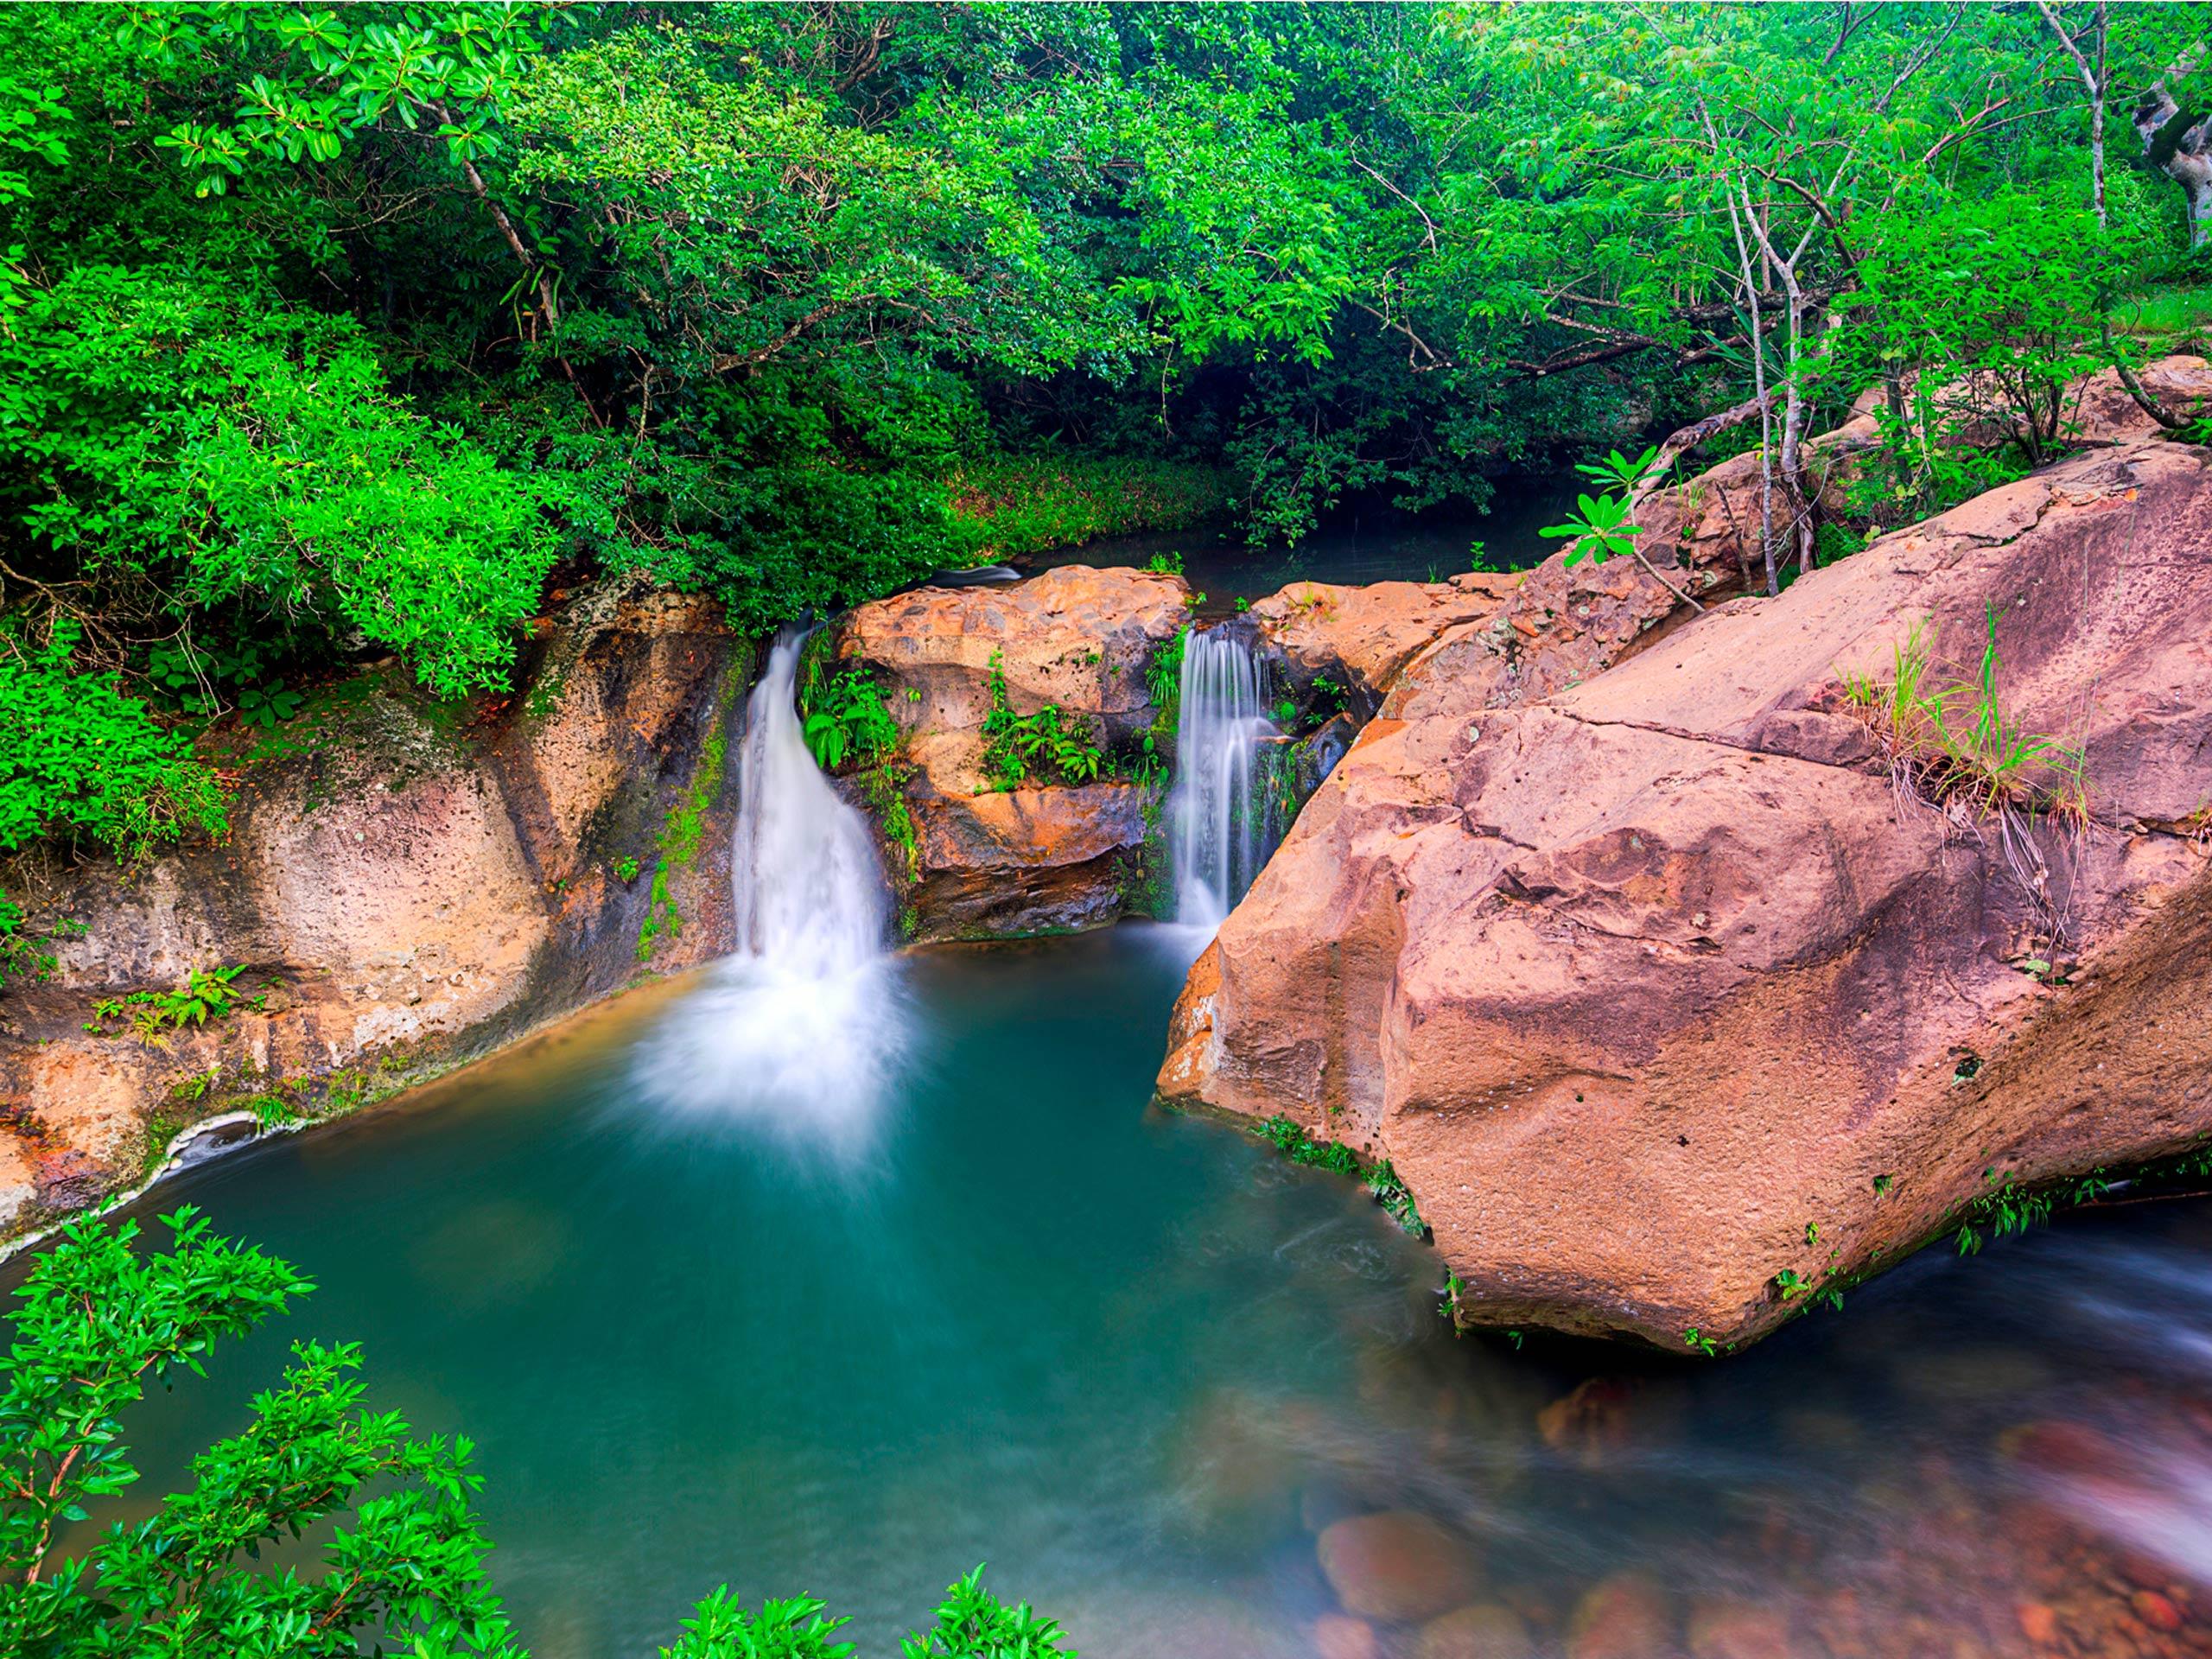 Tropical waterfall in Costa Rica